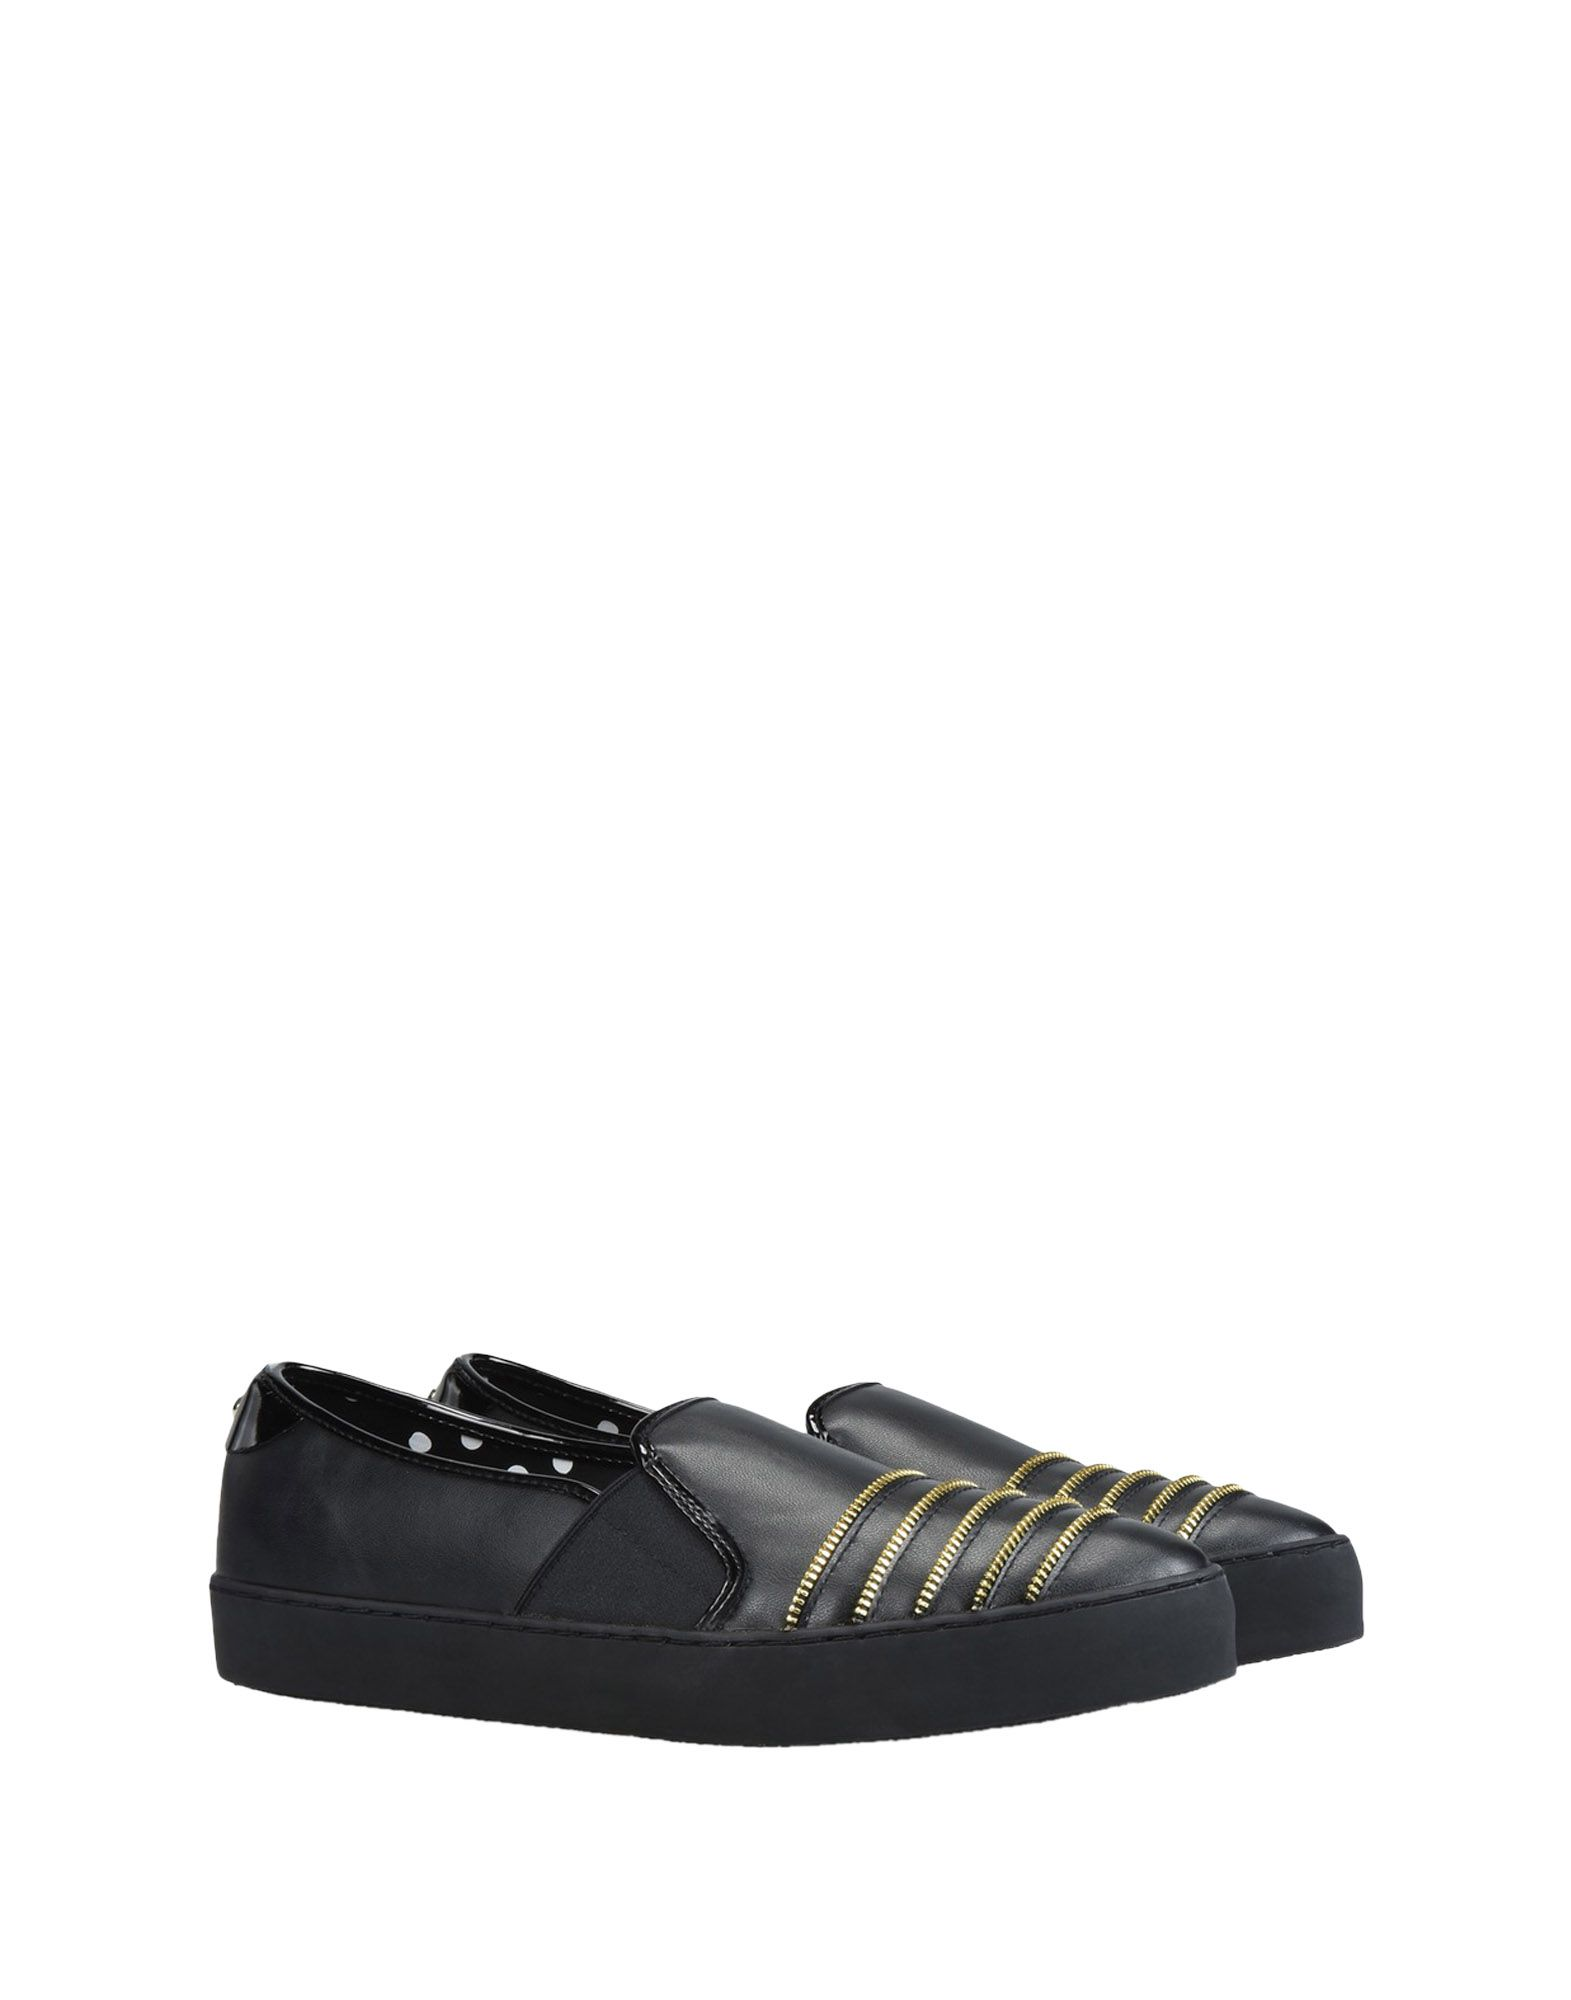 Armani Jeans Sneakers 11443641BS Damen  11443641BS Sneakers Neue Schuhe 88e162